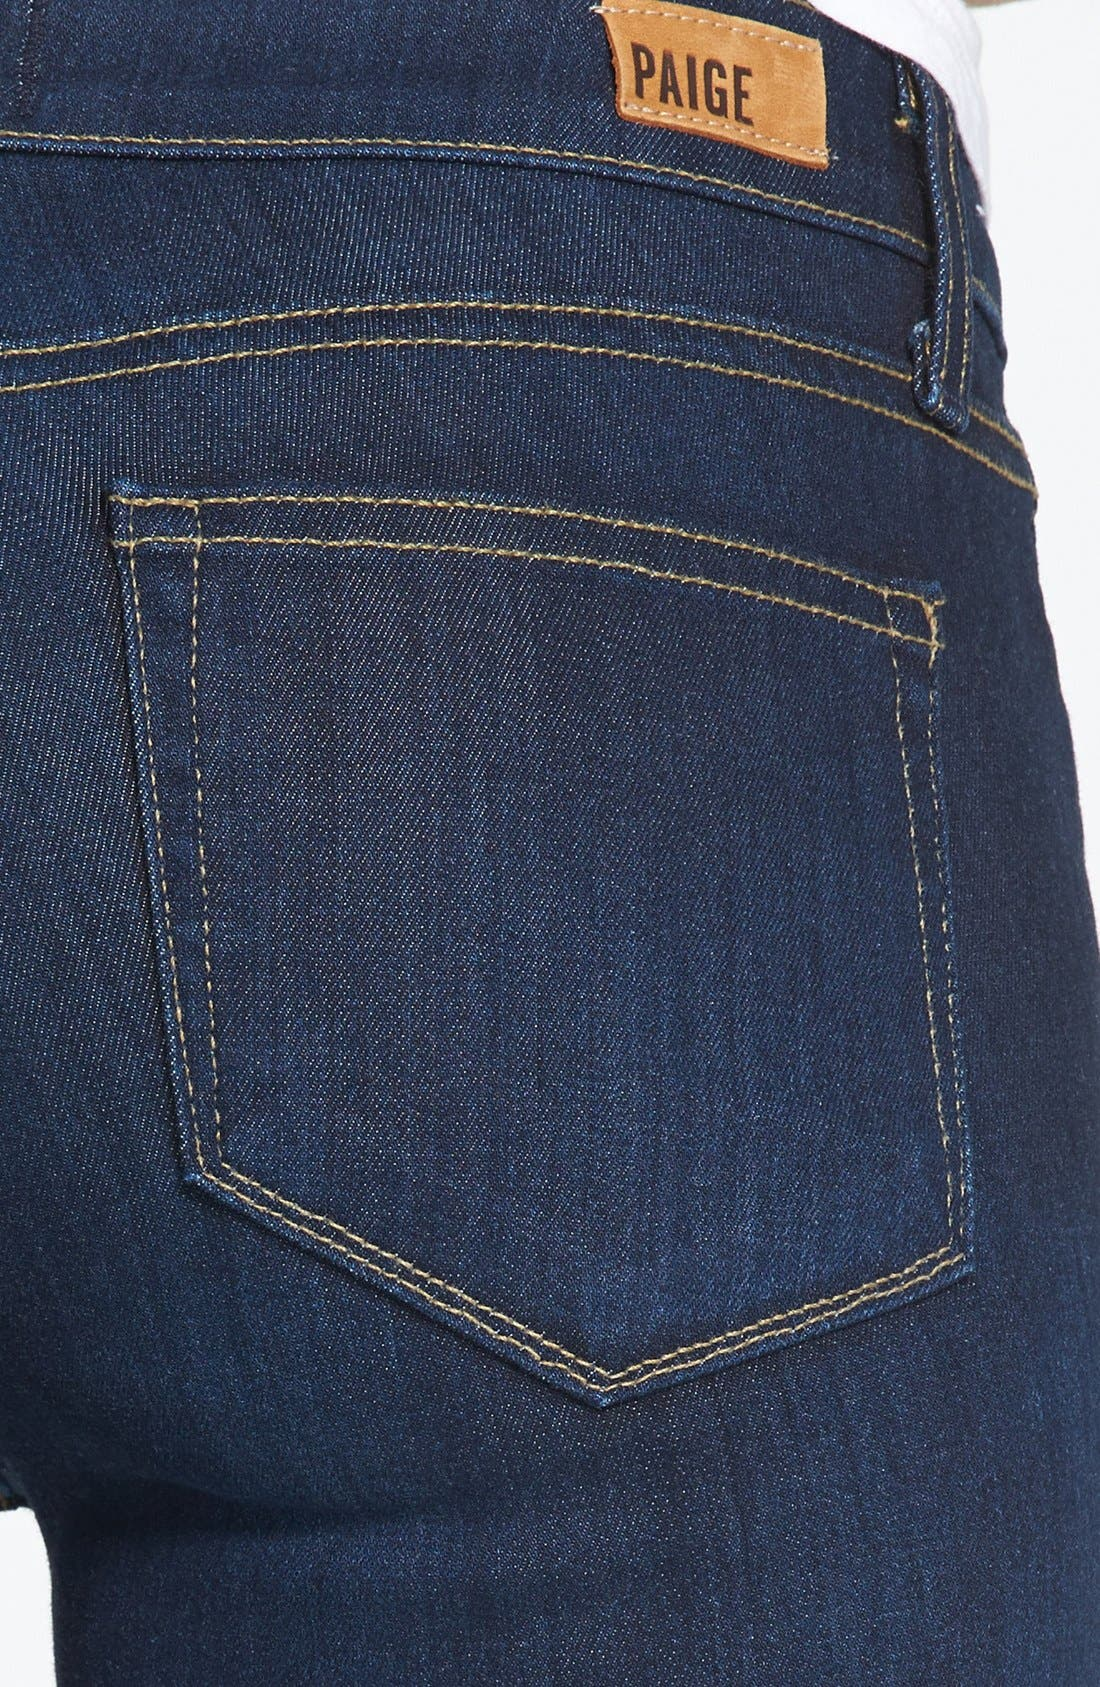 Alternate Image 3  - Paige Denim 'Verdugo' Skinny Ankle Jeans (Ashbury)